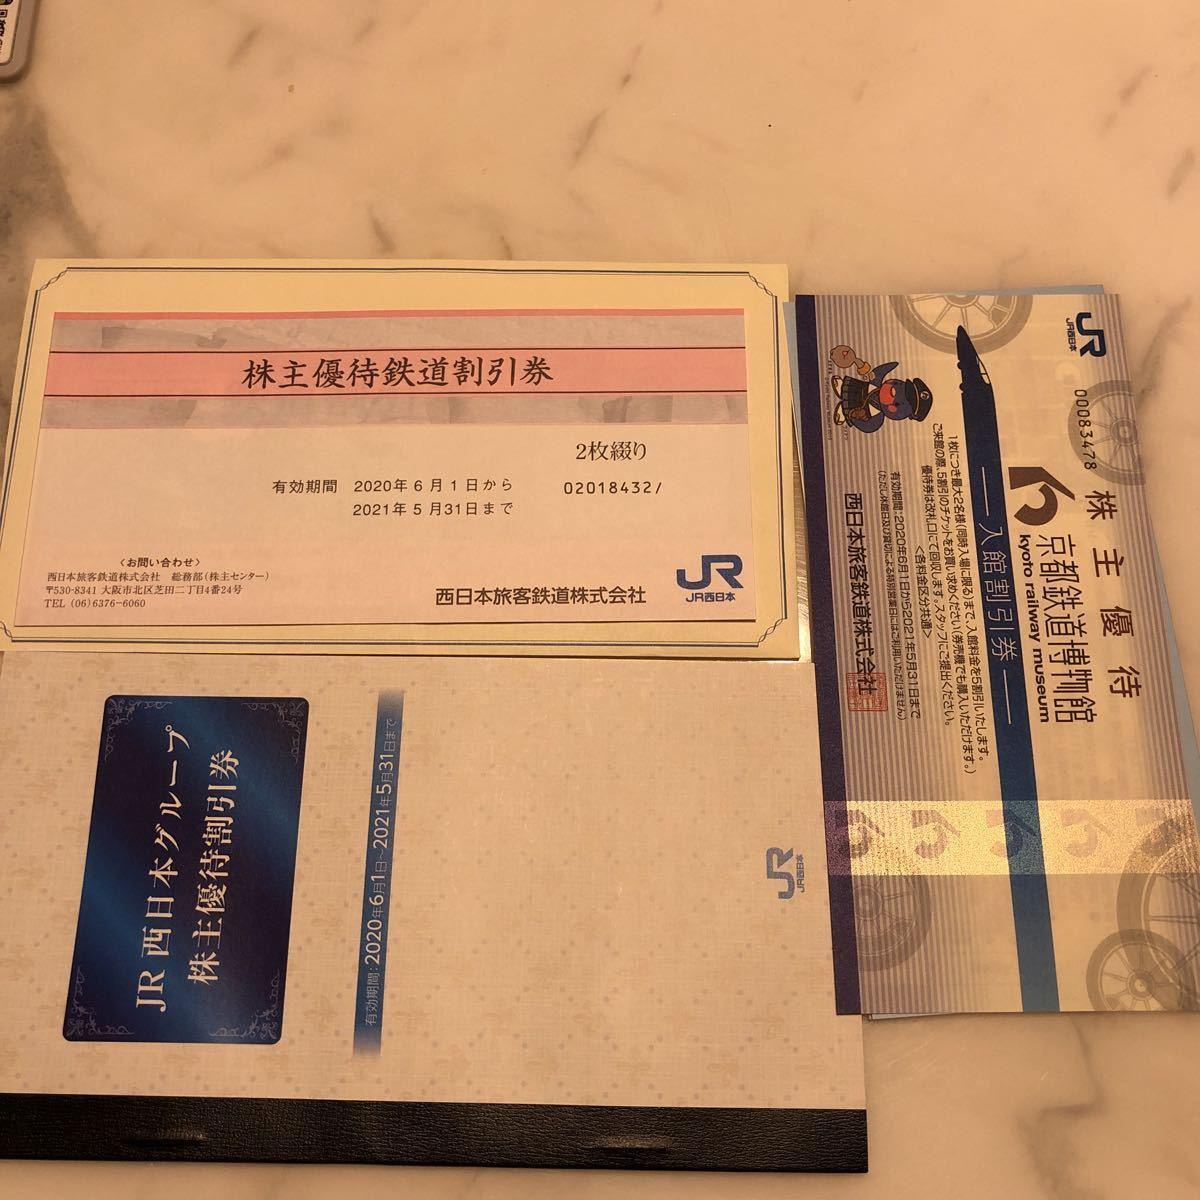 JR西日本 株主優待割引券2枚+優待割引券2021年5月31日まで_画像1